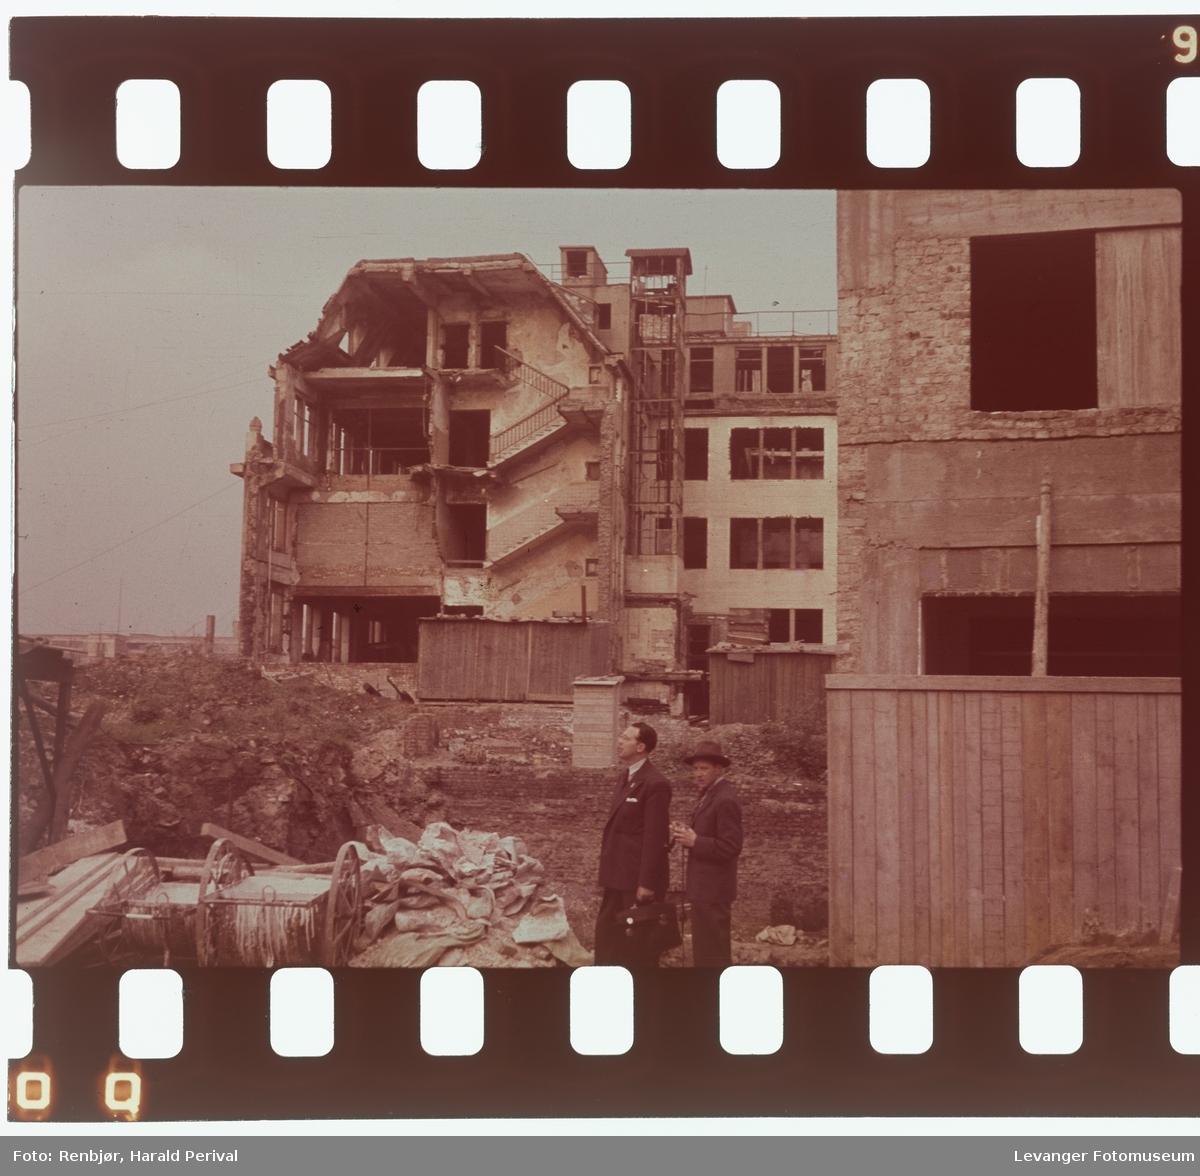 Fra Tyskland i forbindelse med deltakingen på den årlige Fotomessen i Køln.. En by der ruinene fremdeles er fremtredende etter 2.verdenskrig